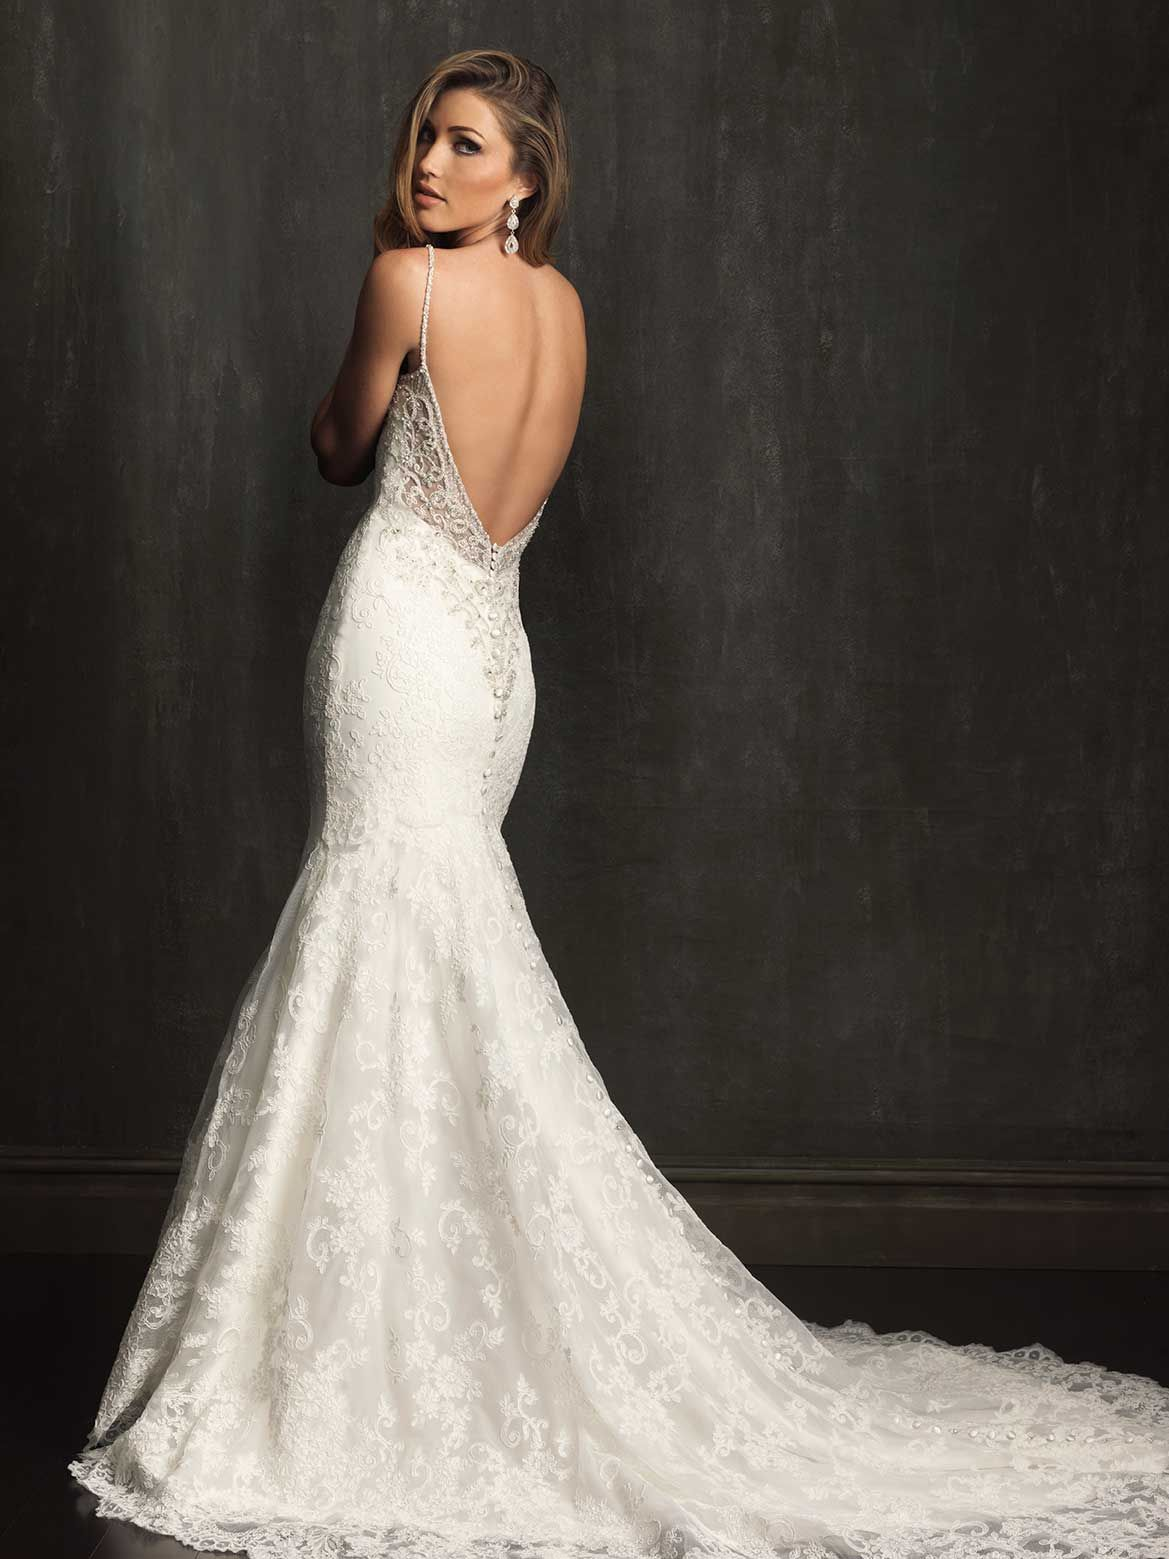 Allure wedding dress  low back wedding gown  Google Search  wedding dresses cakes etc